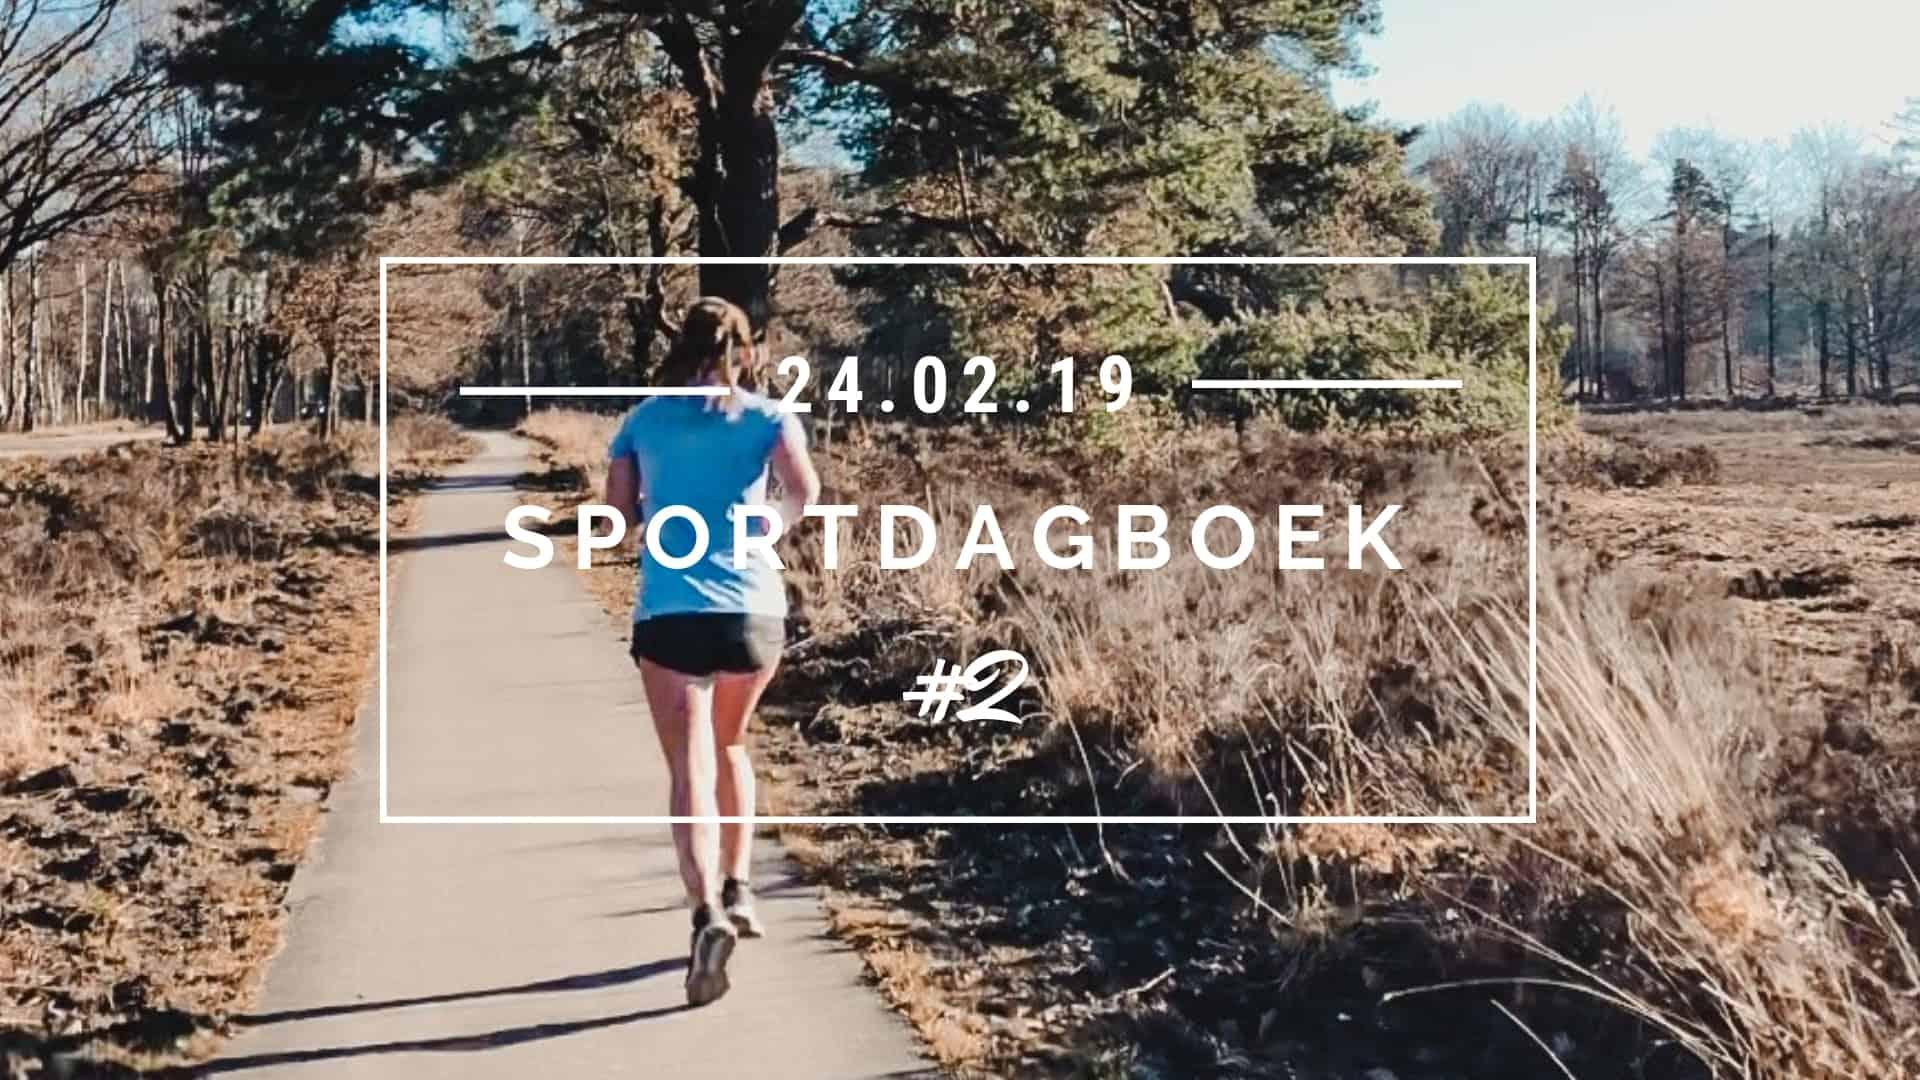 sportdagboek